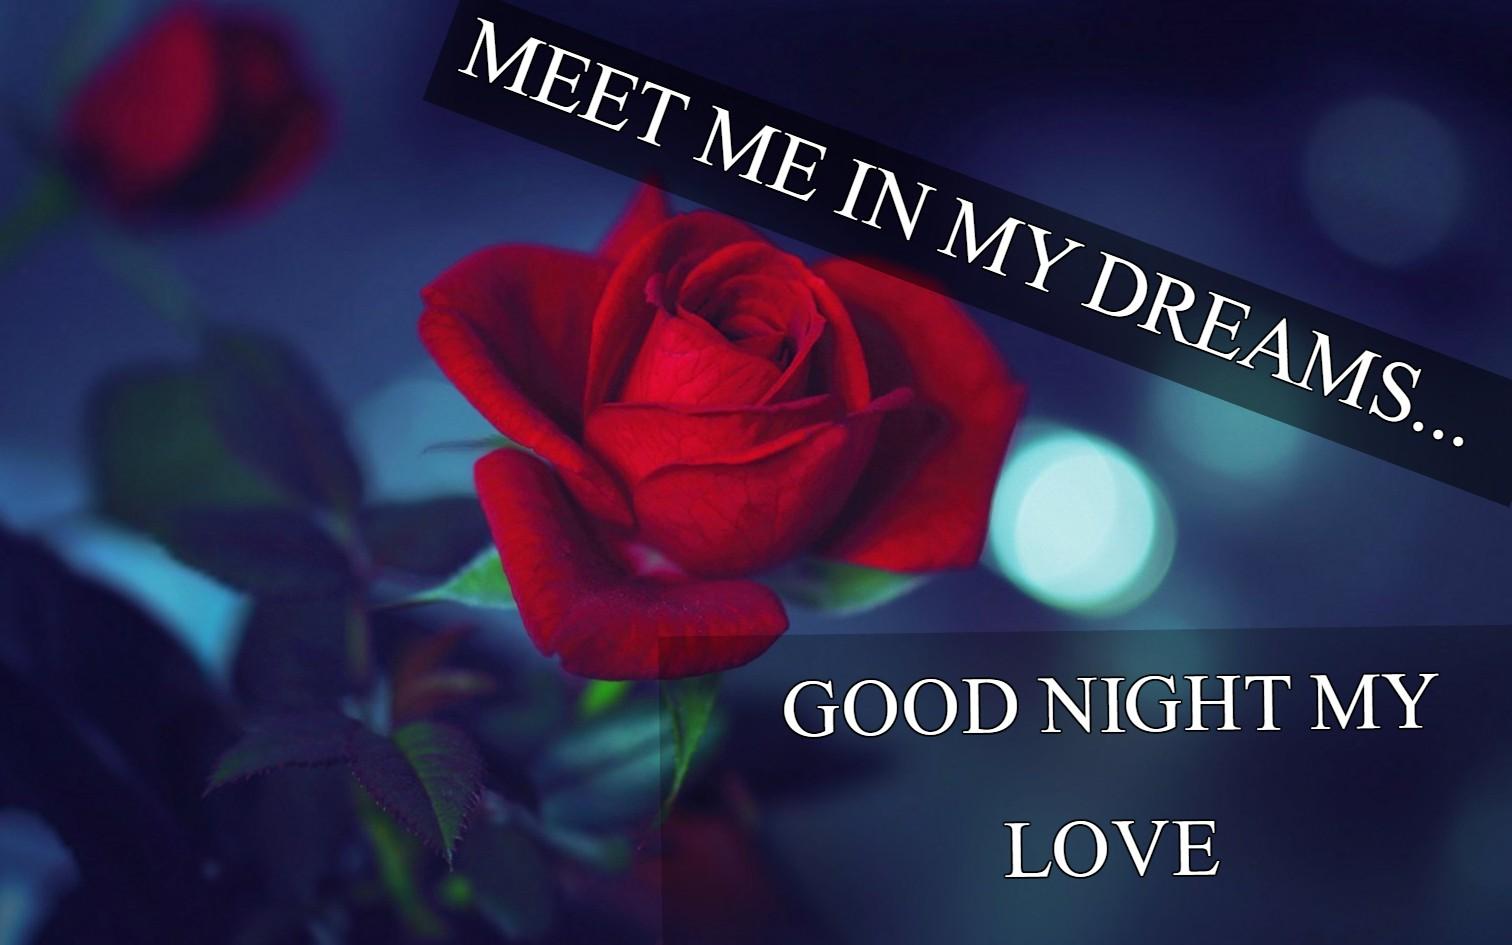 Good night beautiful lovely flowers images kamos hd wallpaper good night images flowers new many hd wallpaper izmirmasajfo